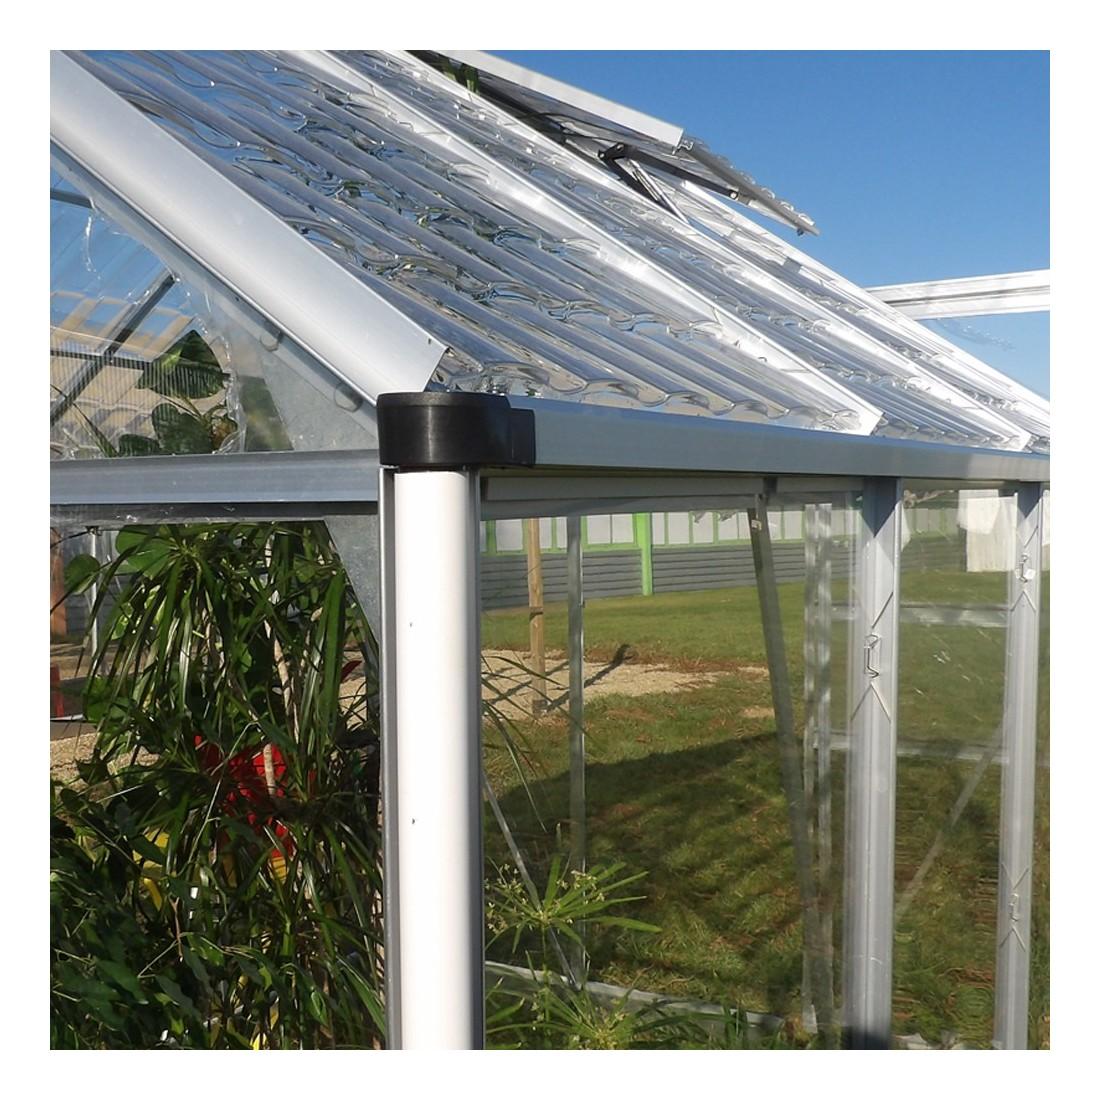 Gouti re serre de jardin en aluminium et polycarbonate - Serre jardin polycarbonate caen ...